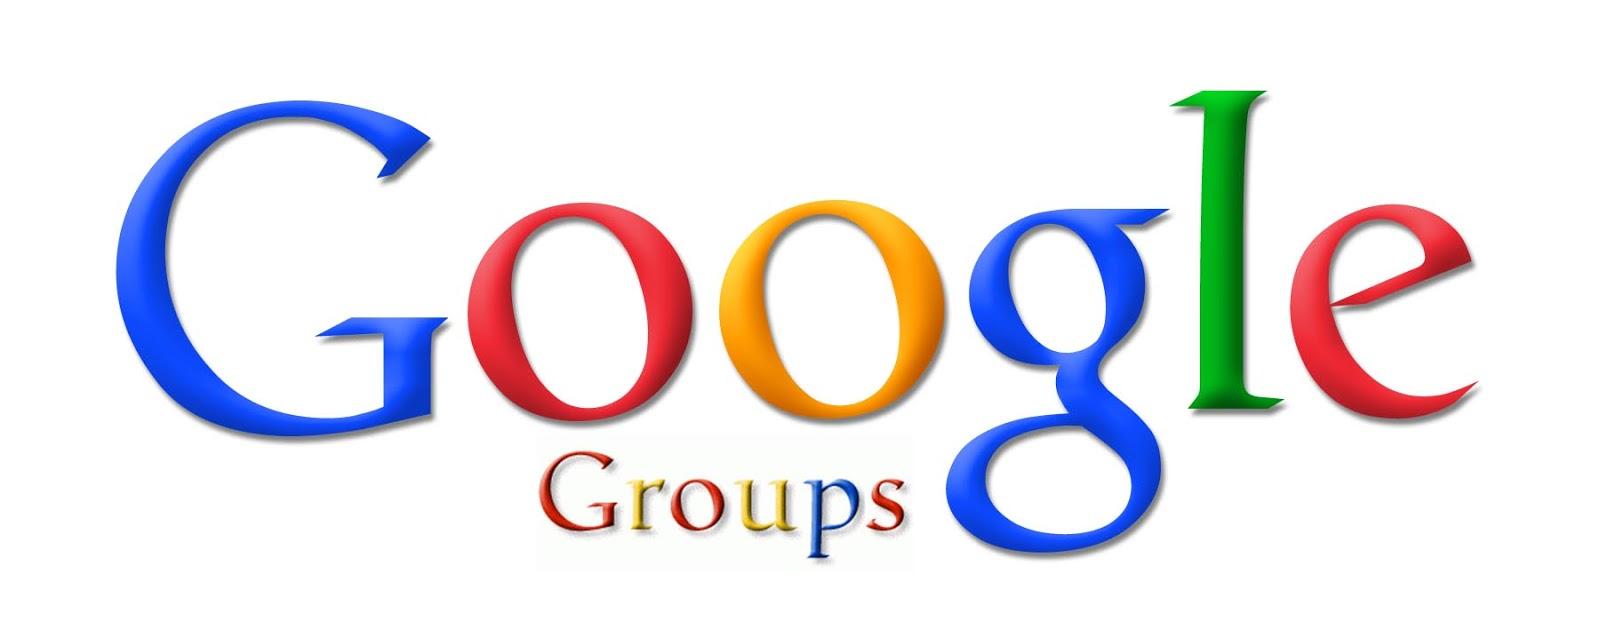 Google Groupes